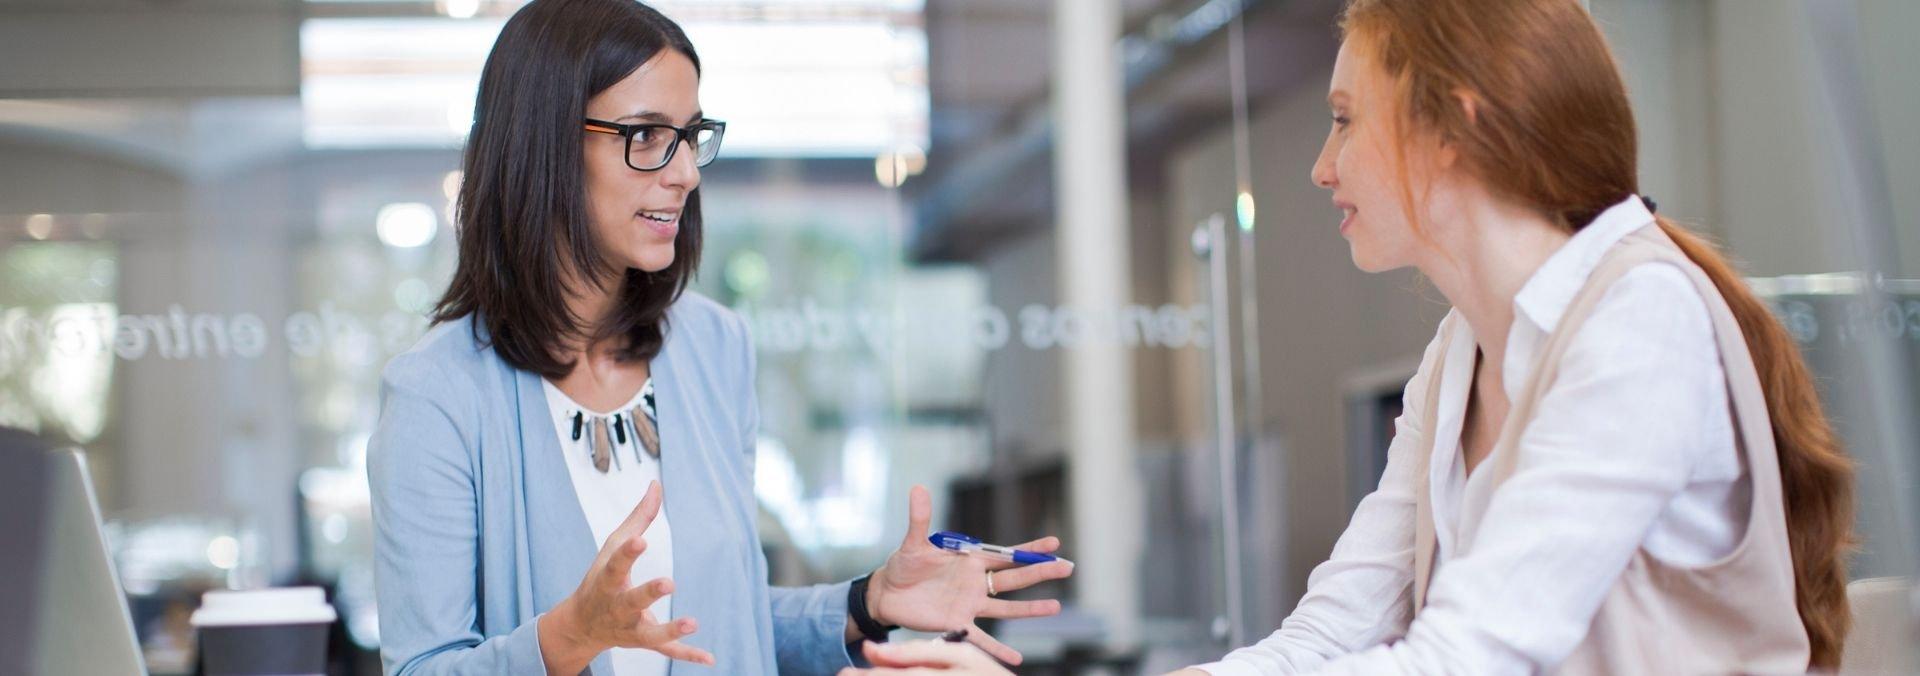 meeting career advisor